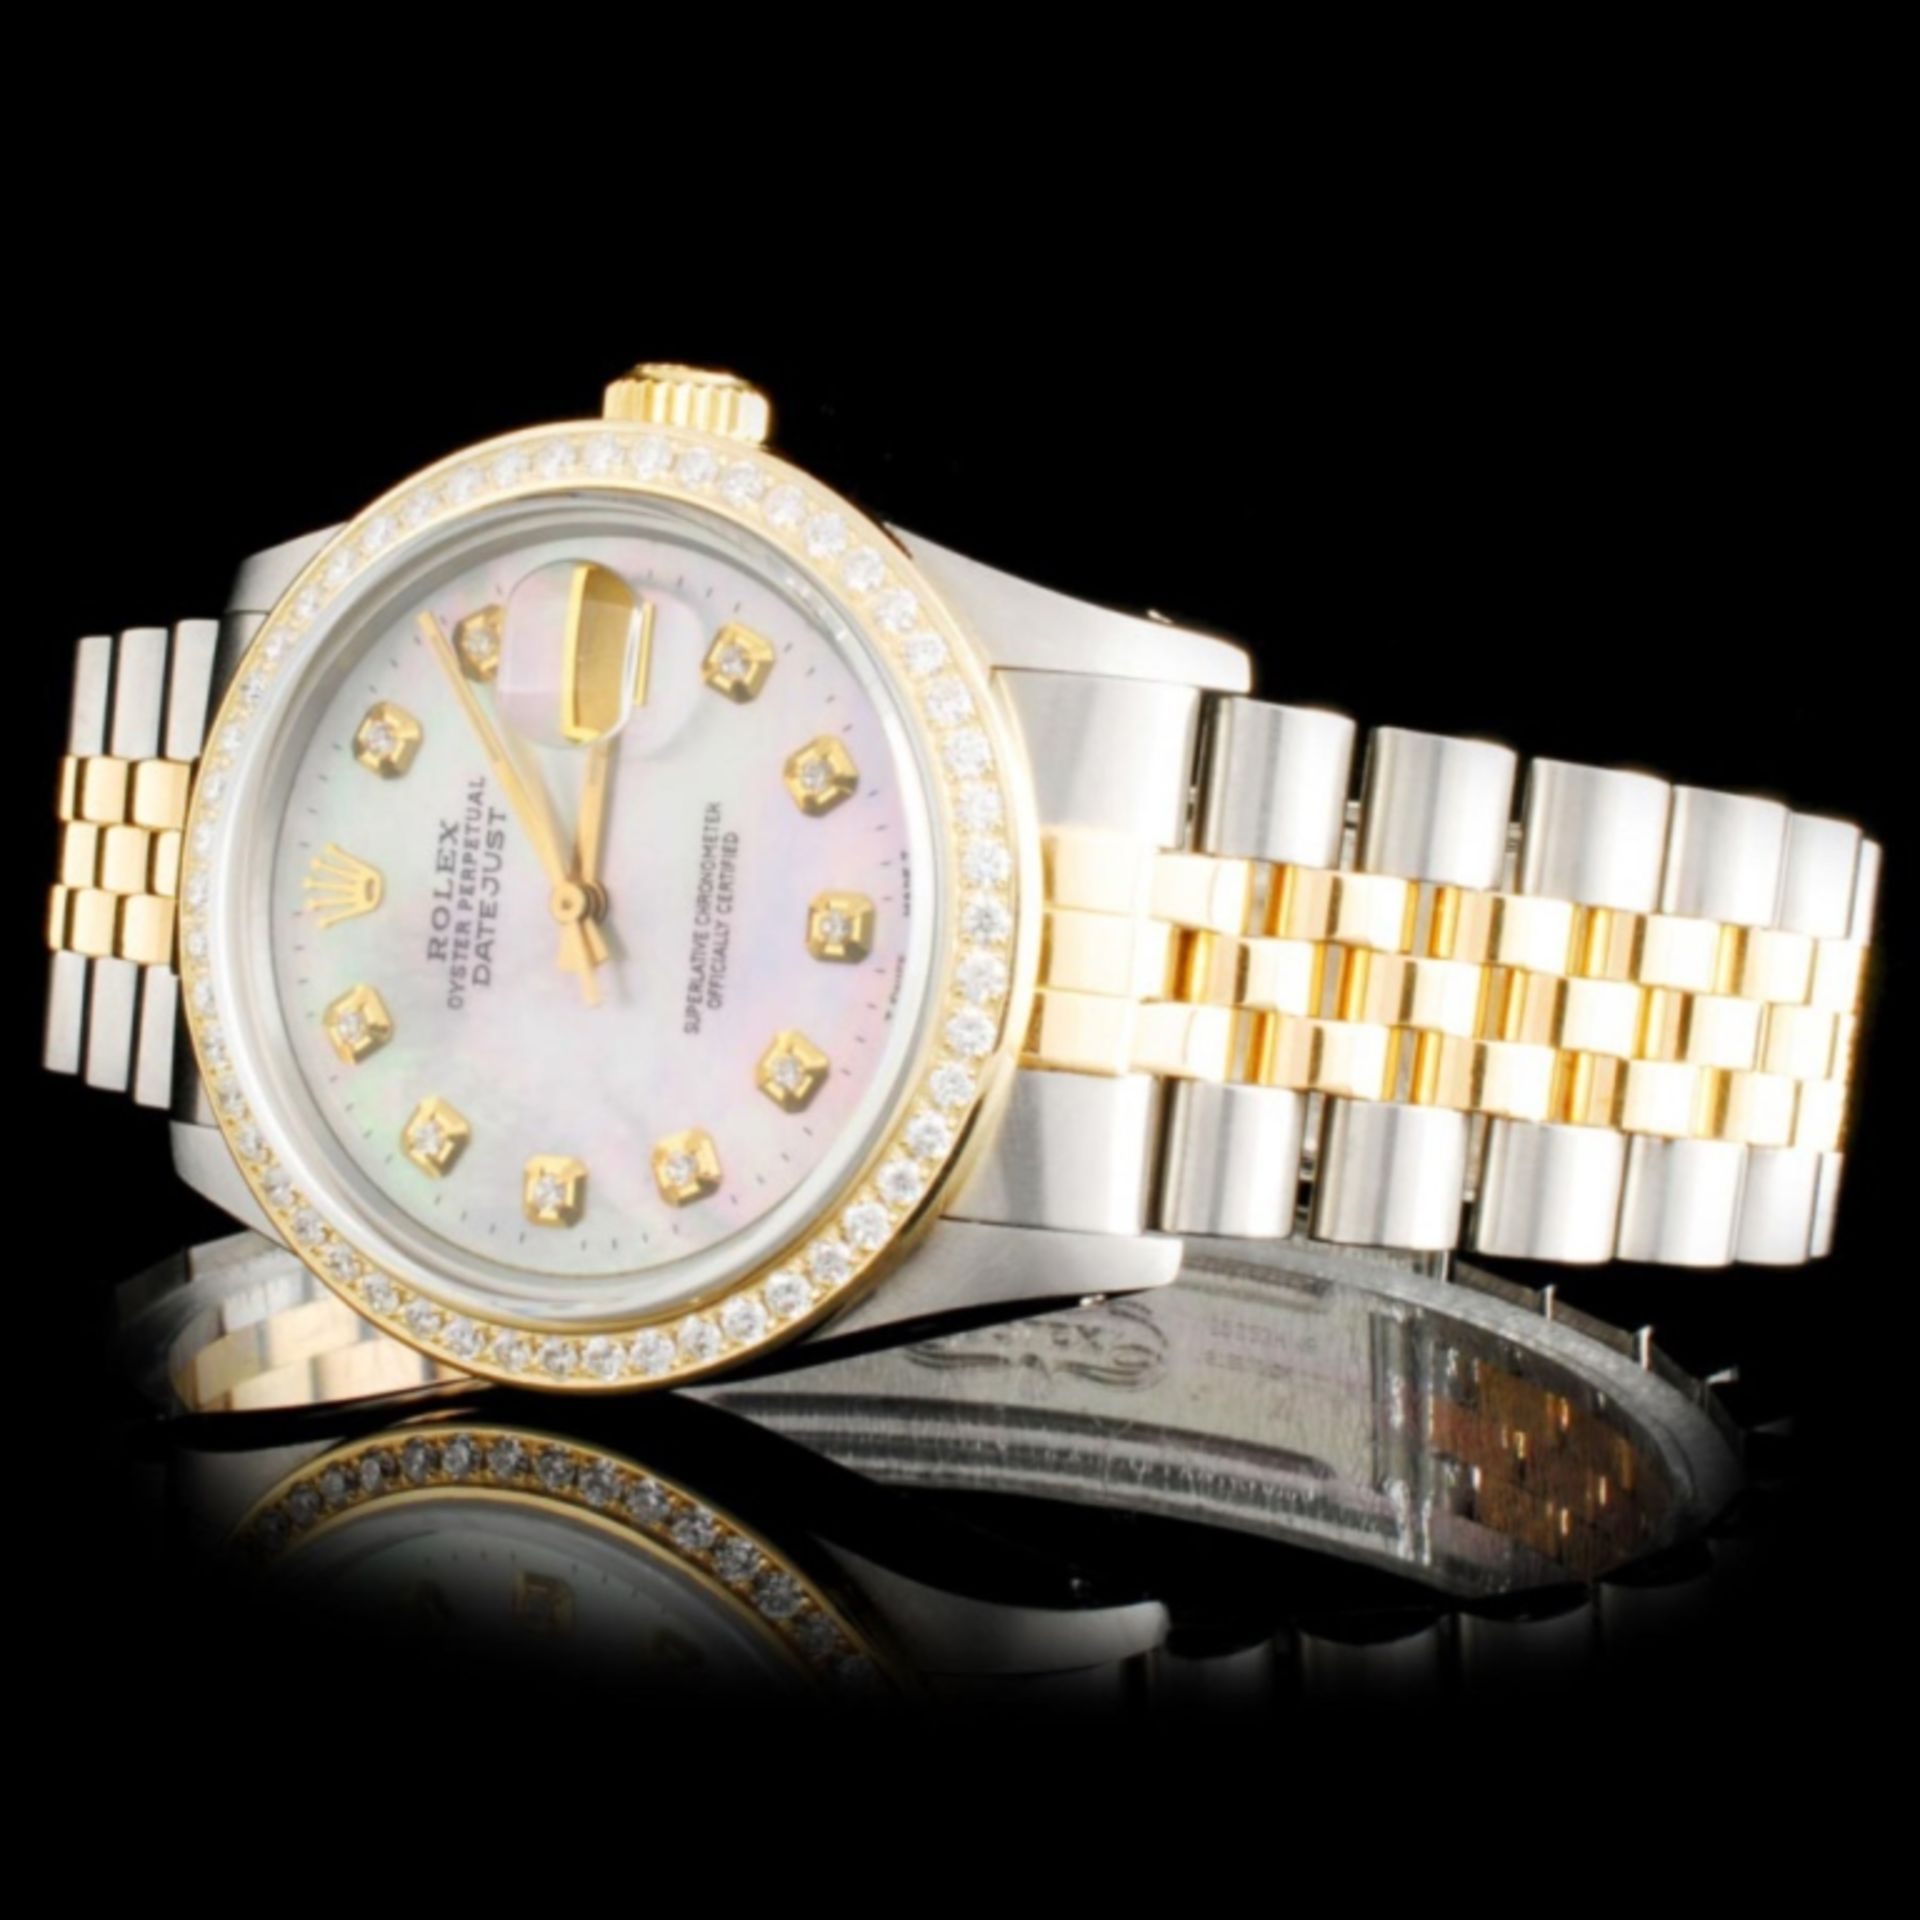 Rolex YG/SS 36MM DateJust Diamond Watch - Image 2 of 5